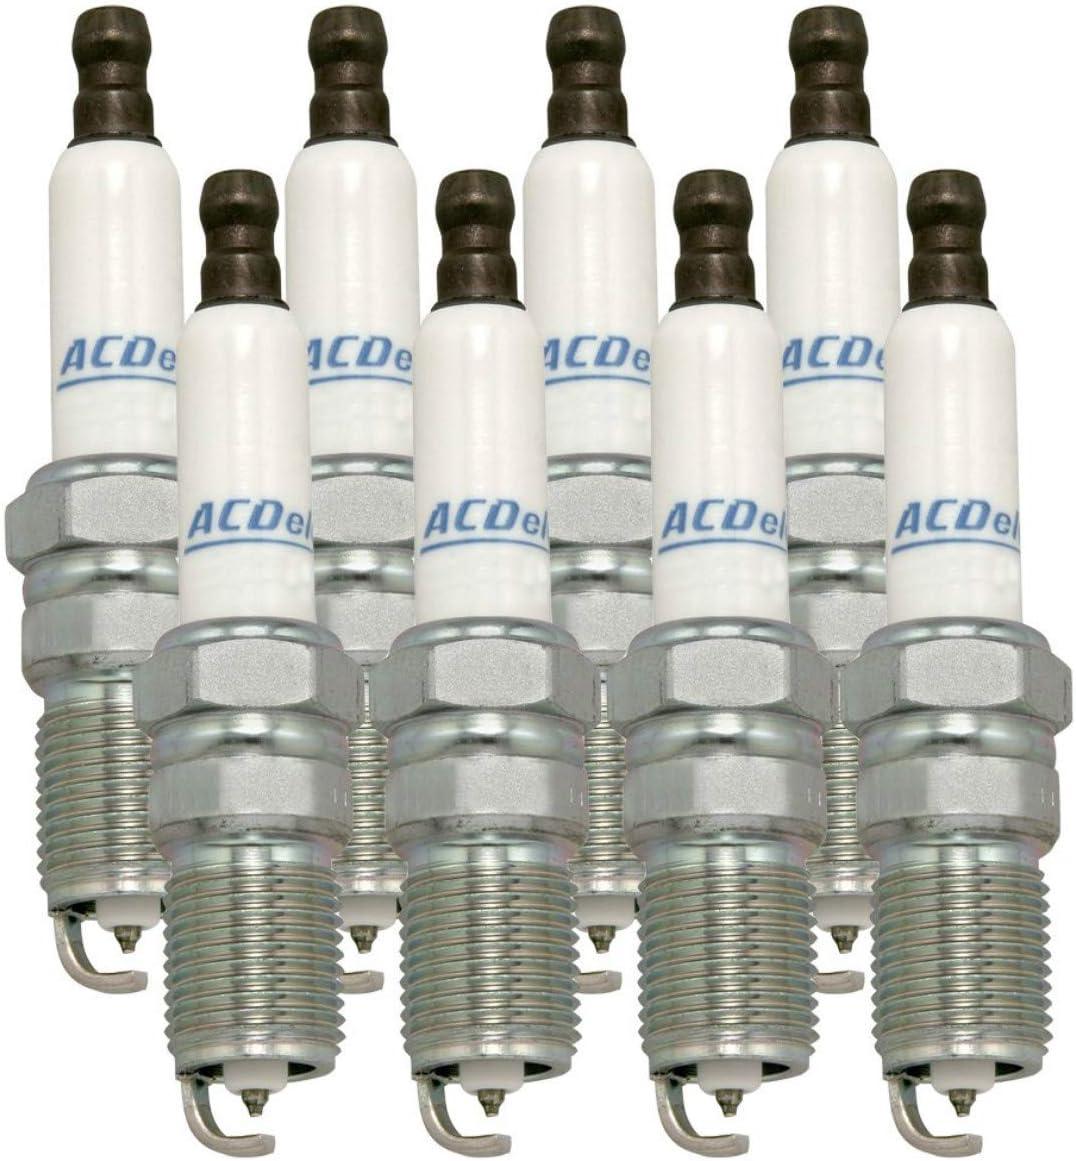 AC Delco 41-962 Professional Platinum Spark Plug for GMC Sierra Chevrolet Silverado 8-Pack